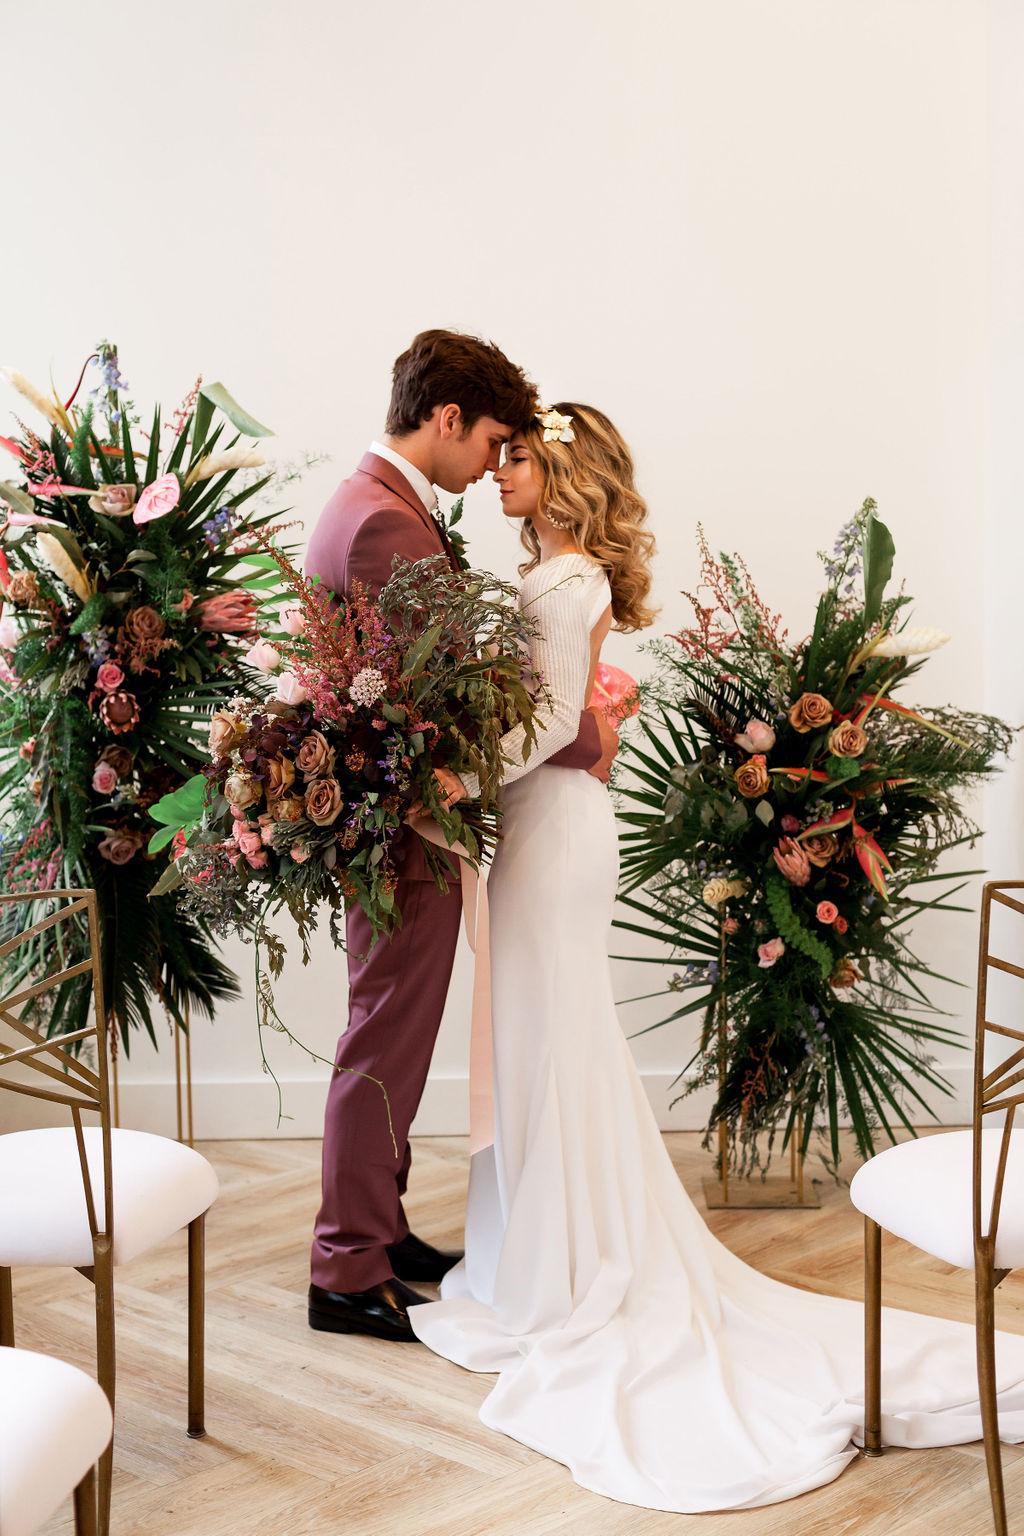 pittsburgh_wedding_photographer_liz_capuano-0558copy.jpeg